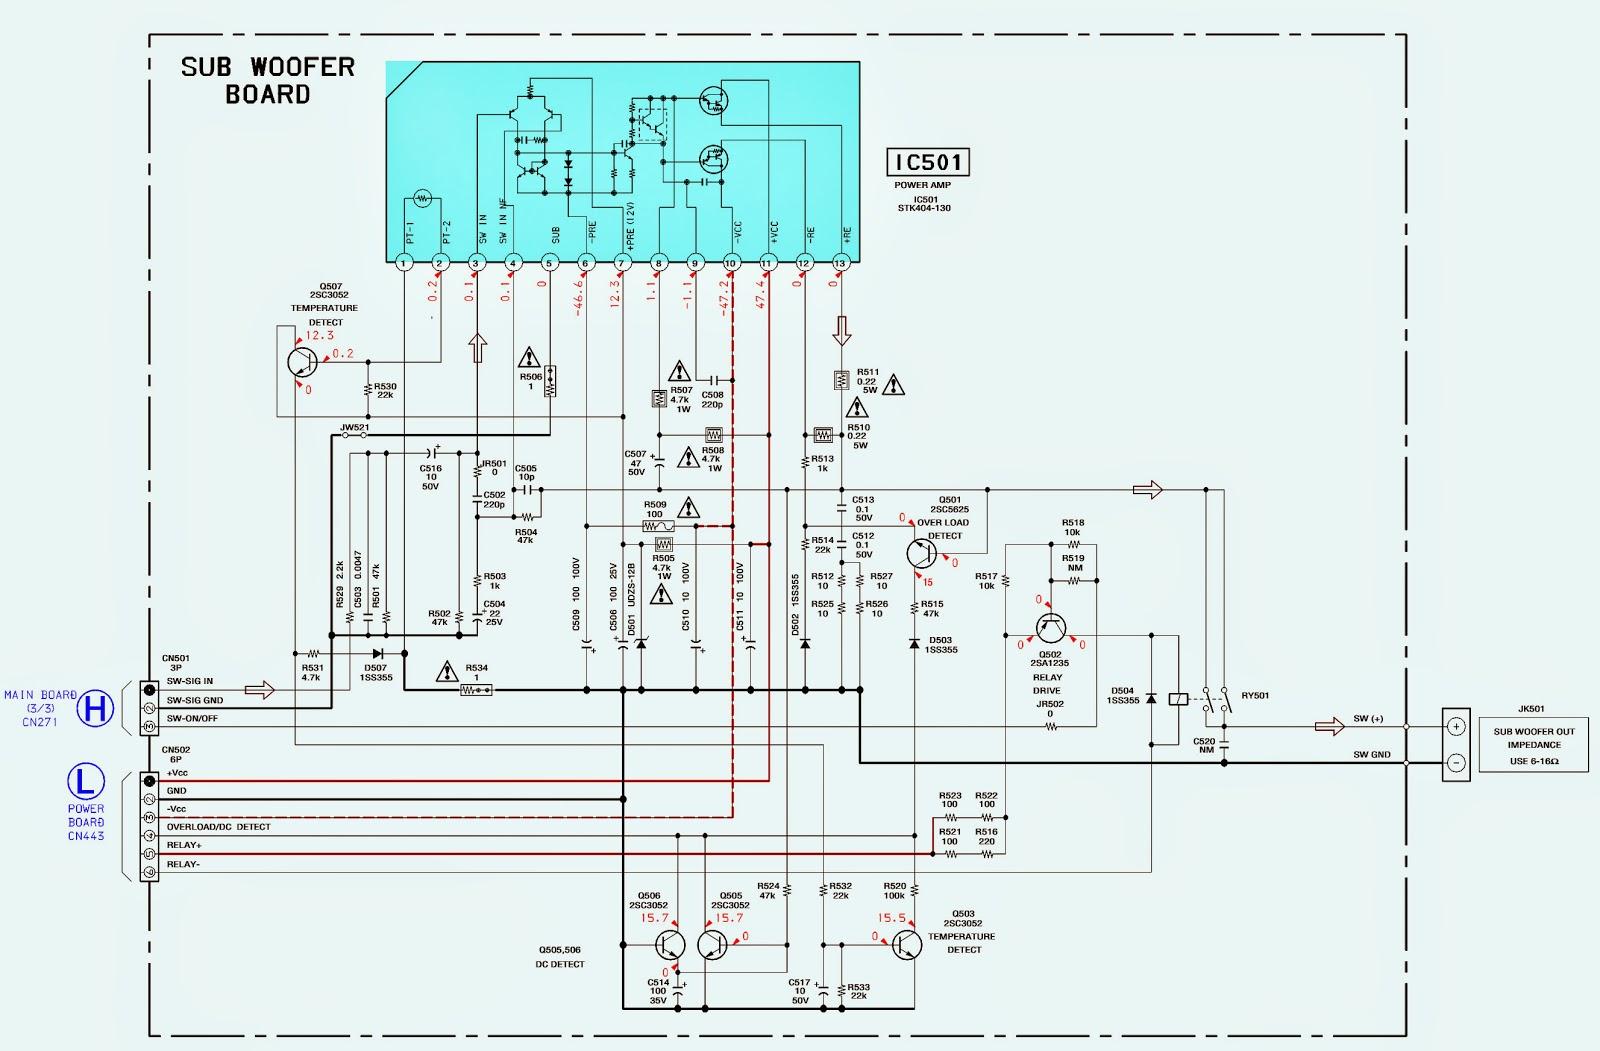 Stk403-130 datasheet